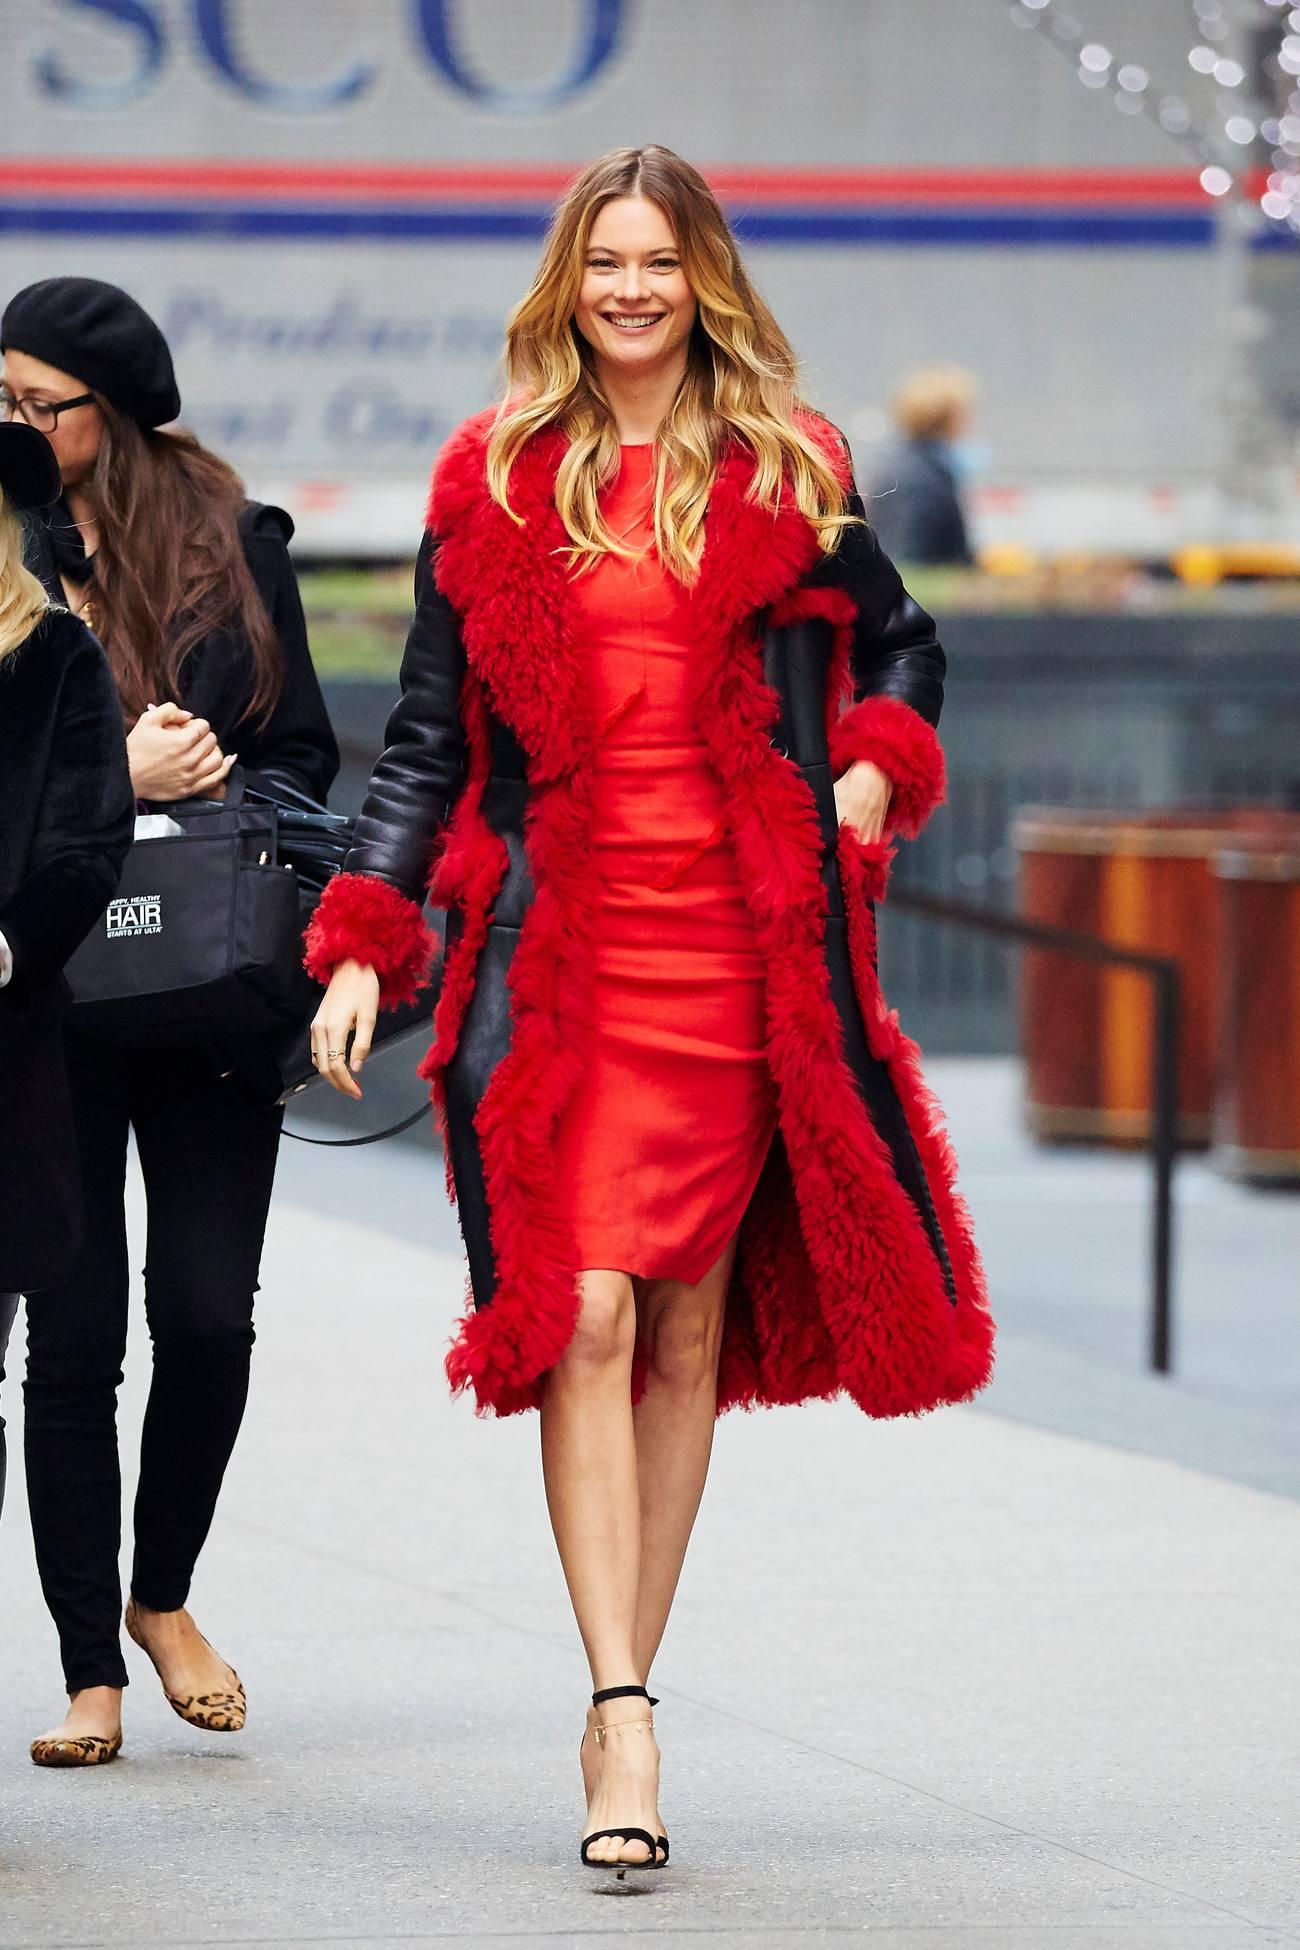 Behati Prinsloo Red Beauty in NYC-2